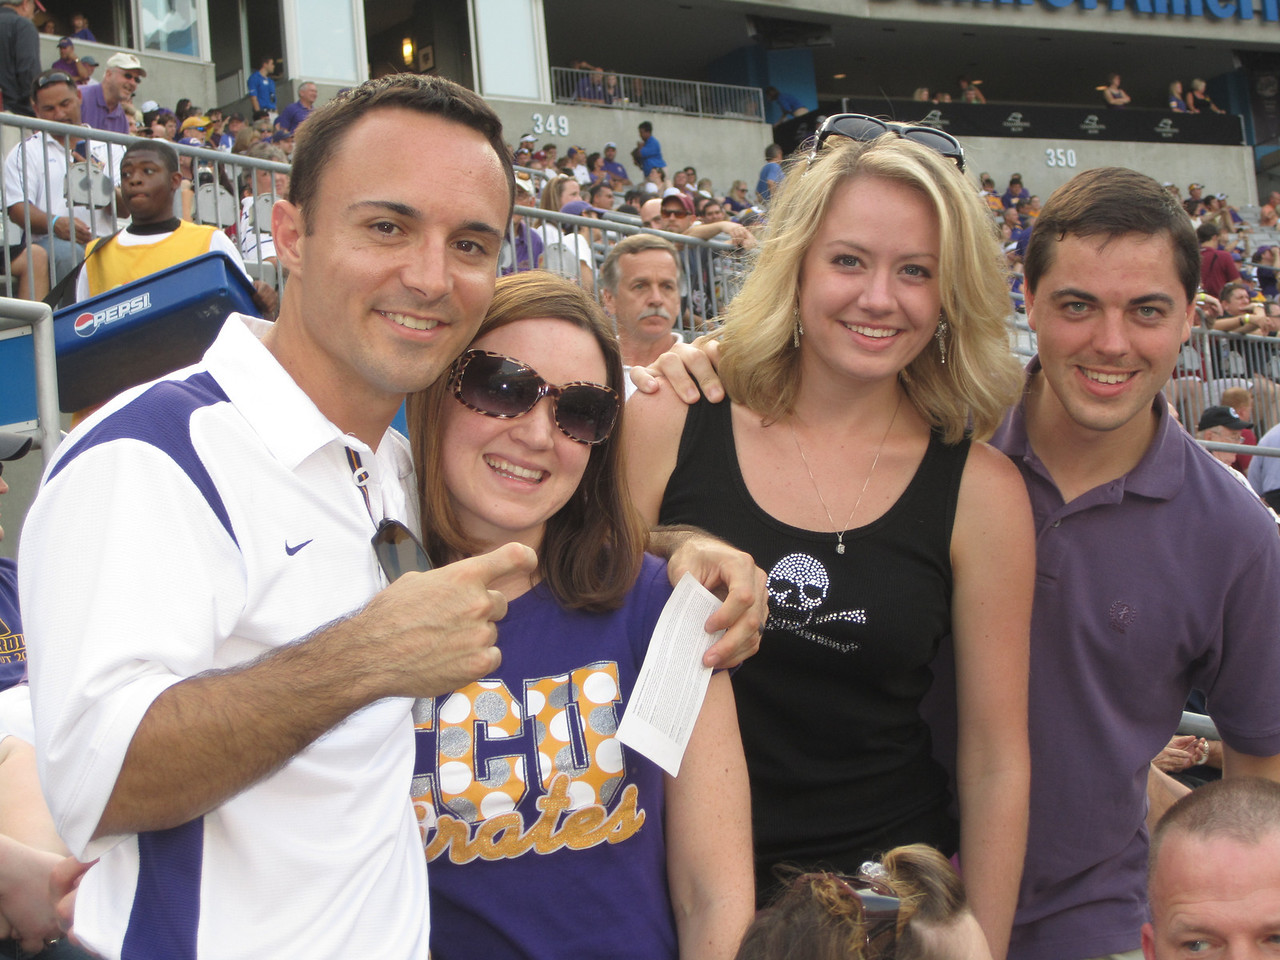 9/3/2011 ECU vs South Carolina  Chris, Heather, Brittany, Kevin